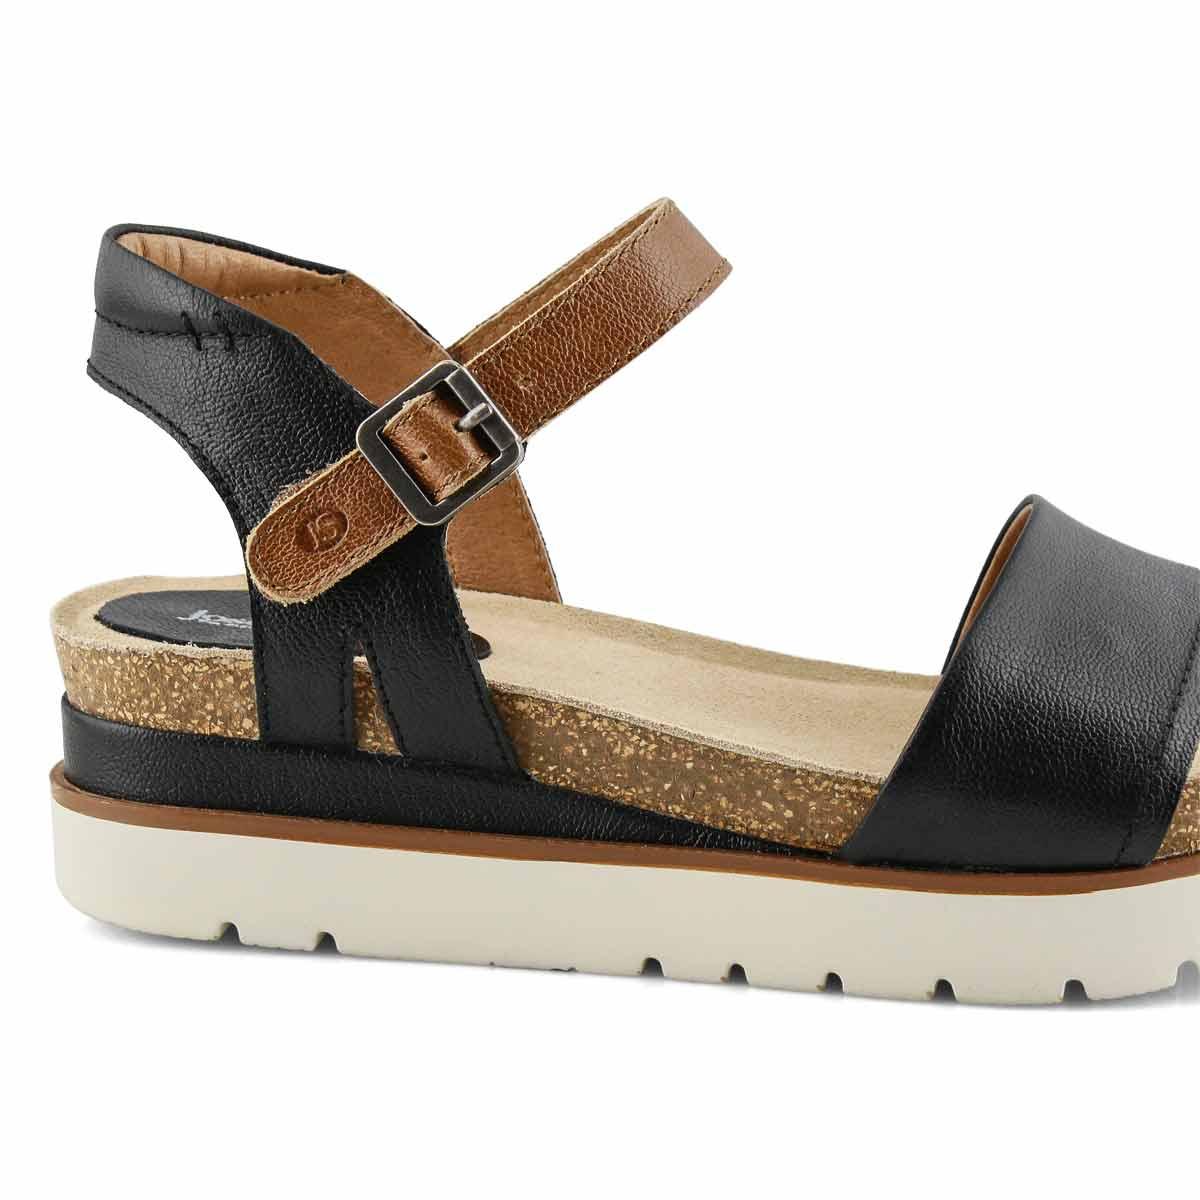 Lds Clea 01 black casual sandal